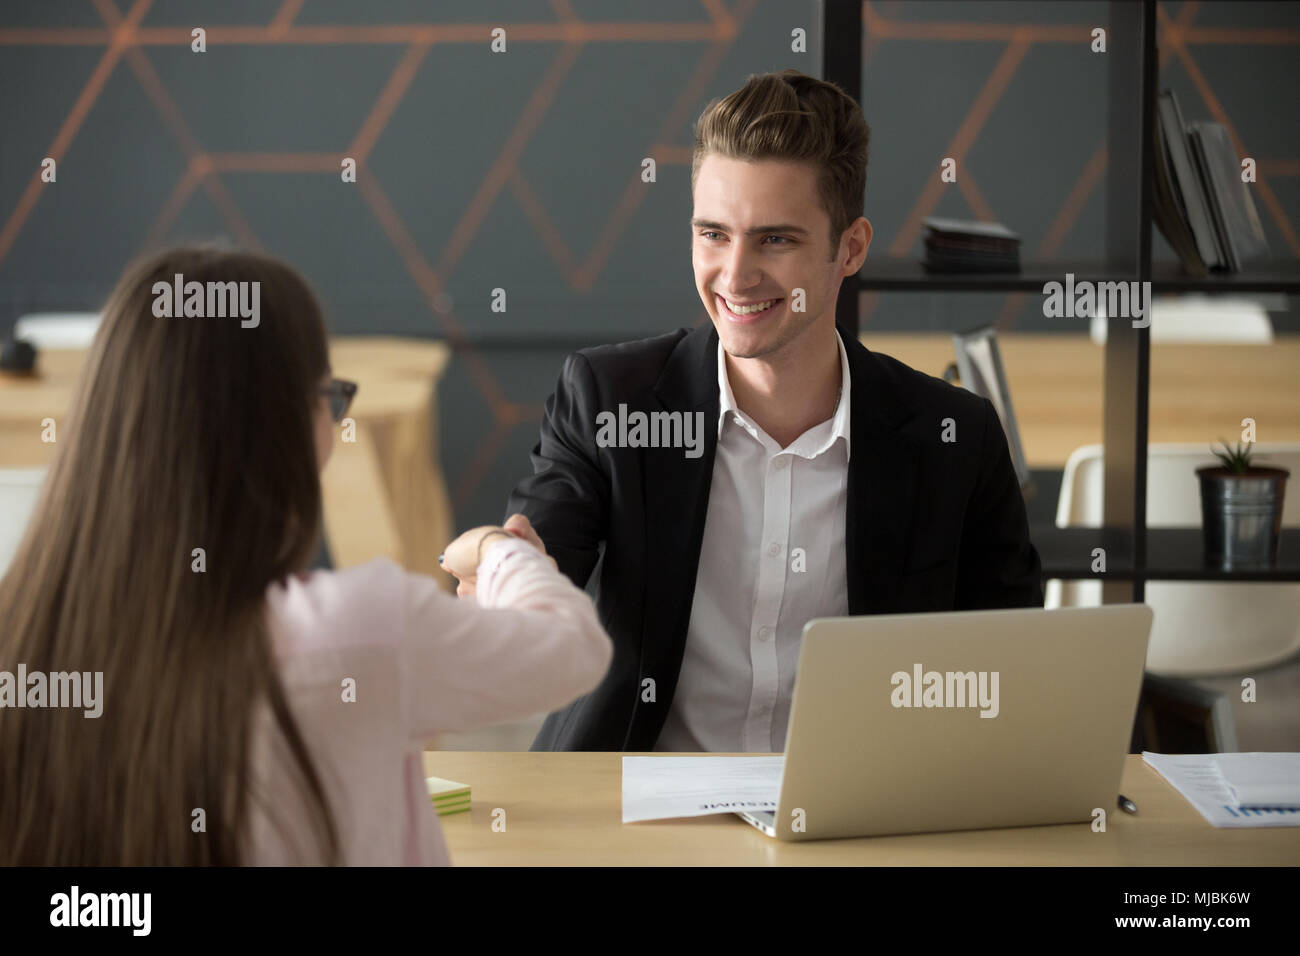 Smiling hr employer handshaking successful job applicant hiring  - Stock Image